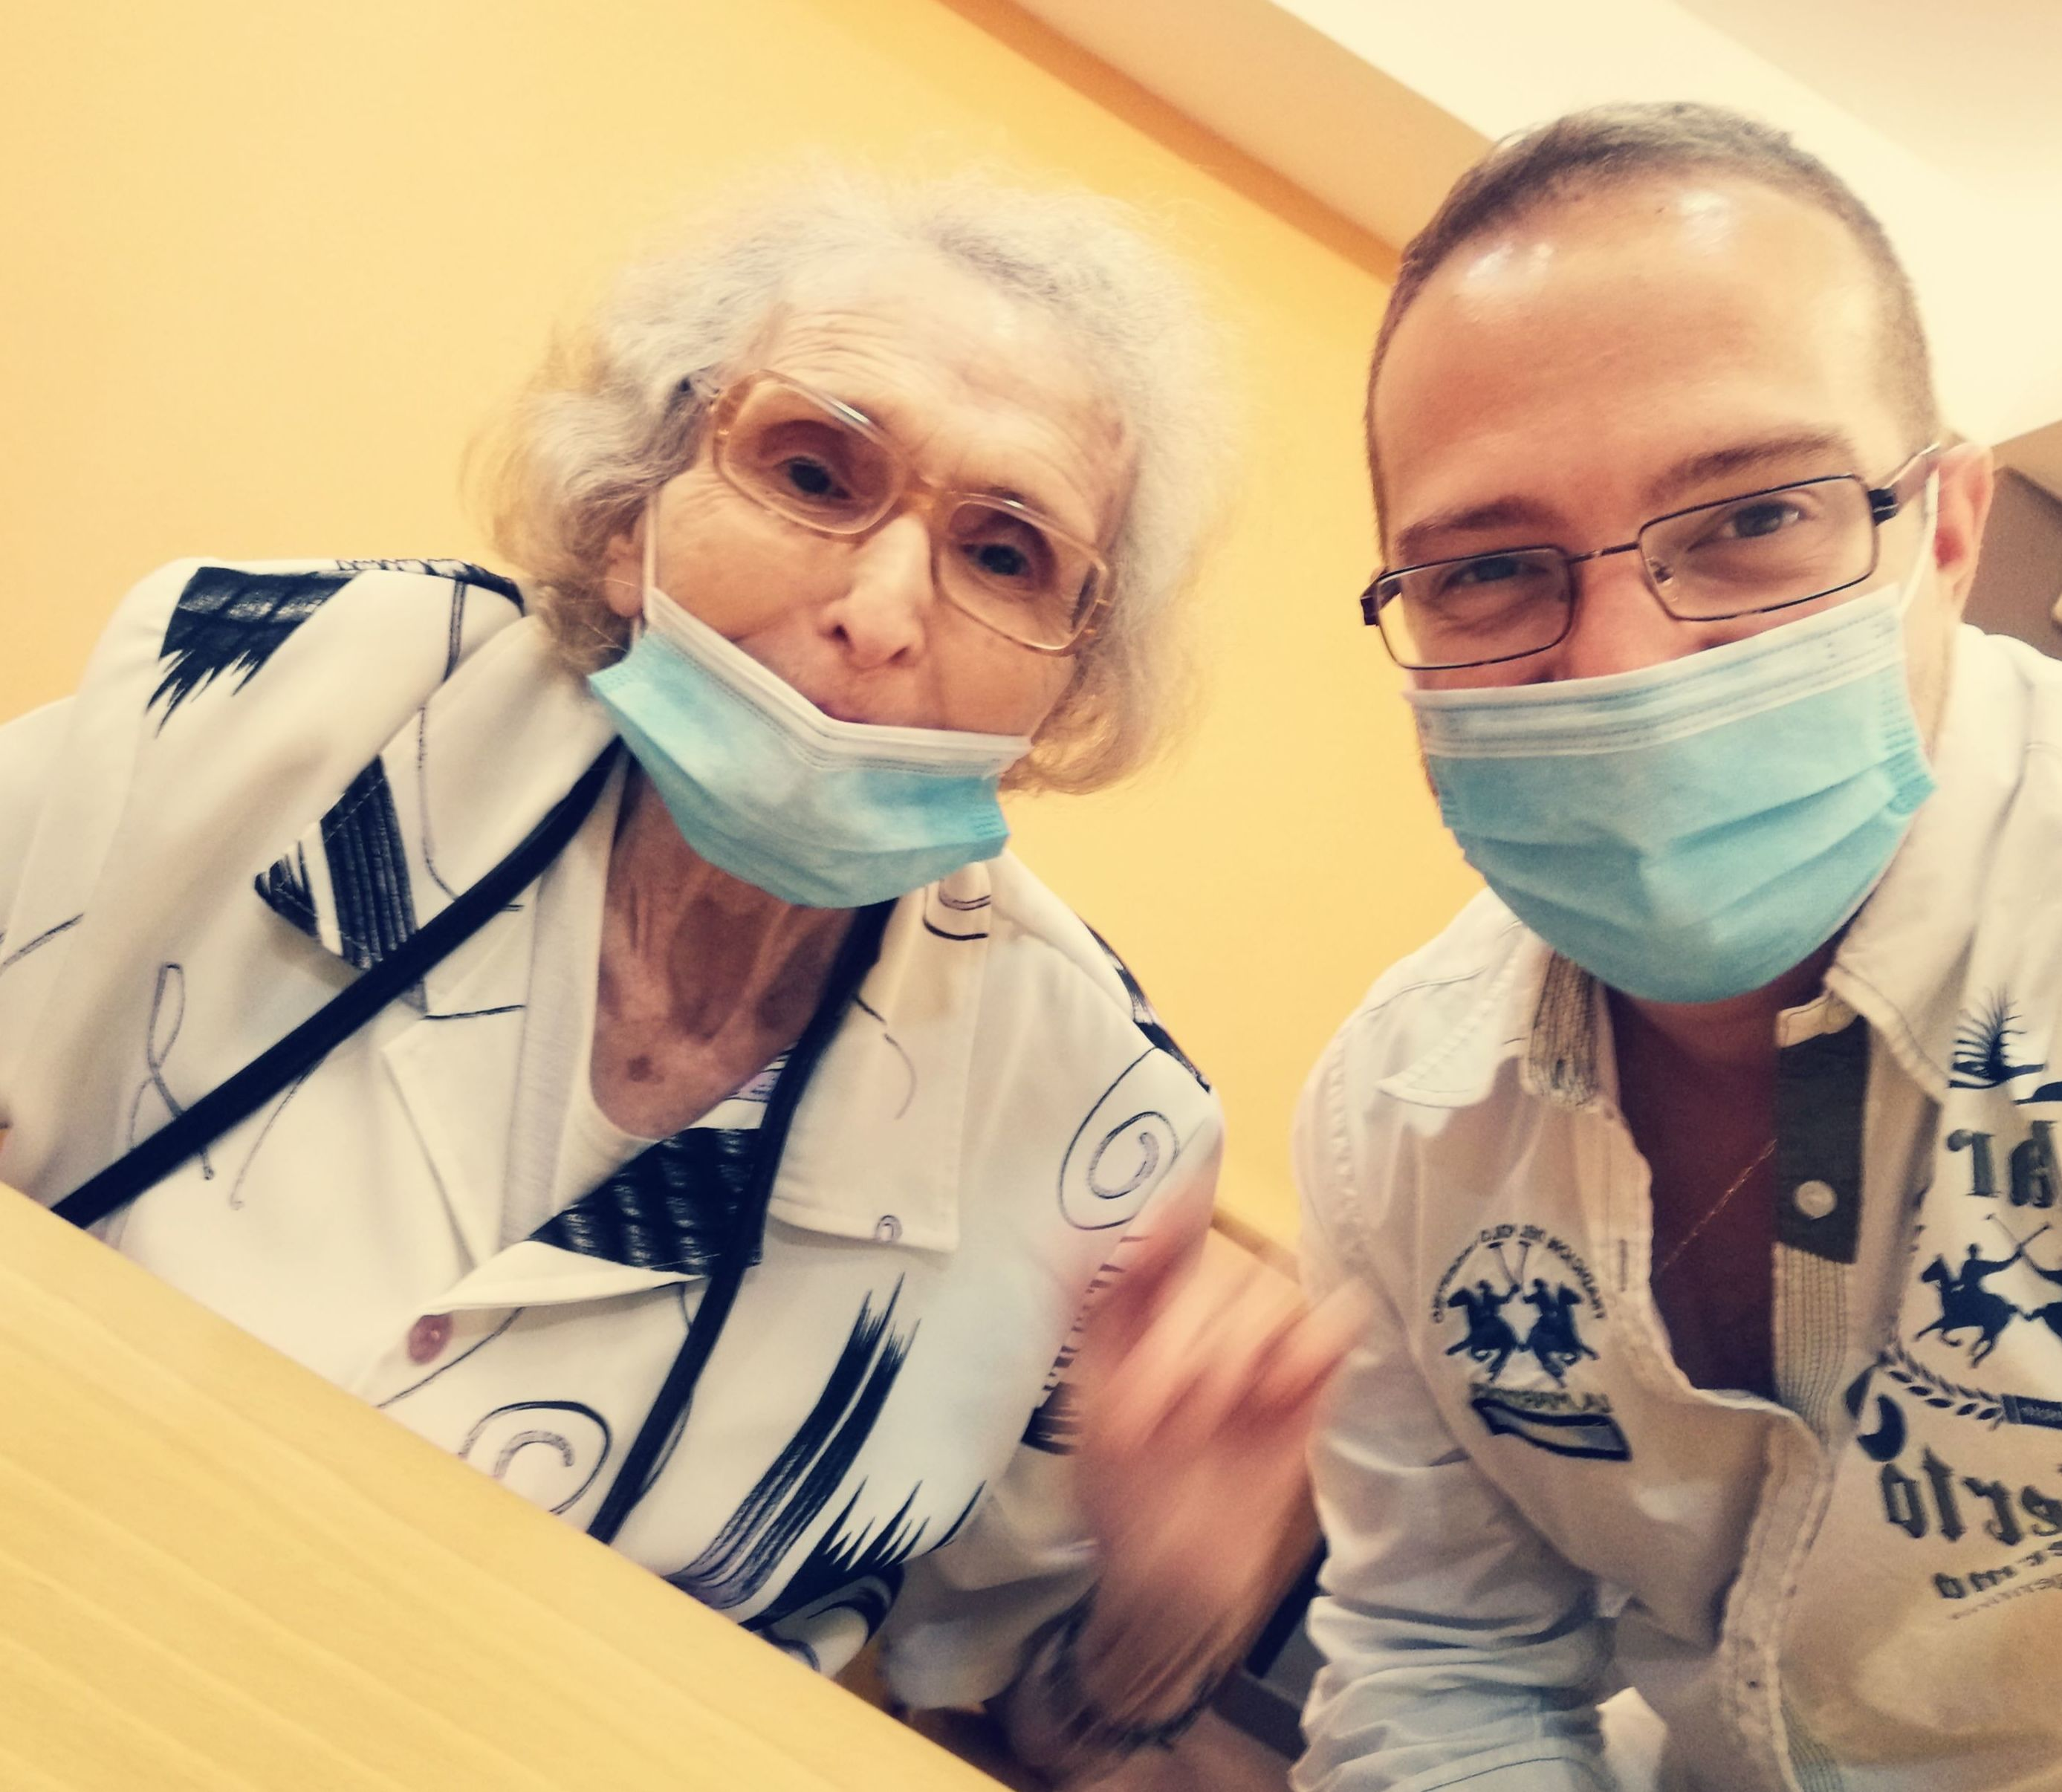 Centros de día para personas mayores Eixample (Barcelona)